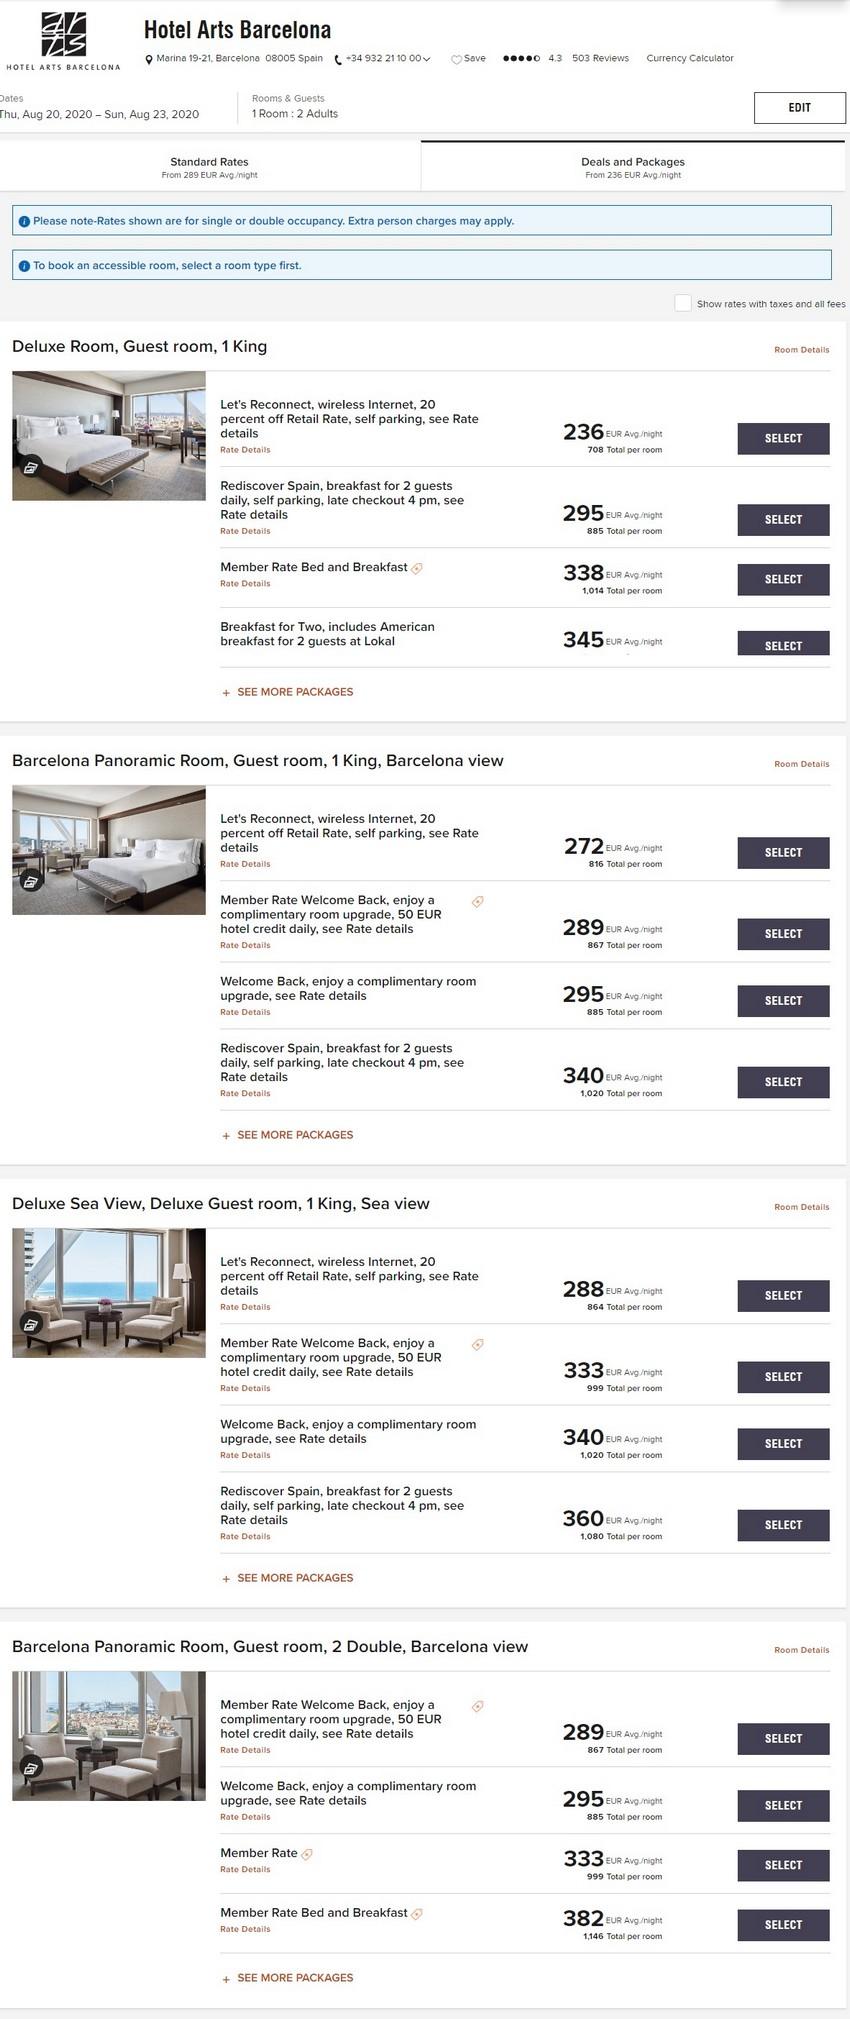 Marriott Elevate Your Stay Raten im Sommer 2020 im Hotel Arts Barcelona